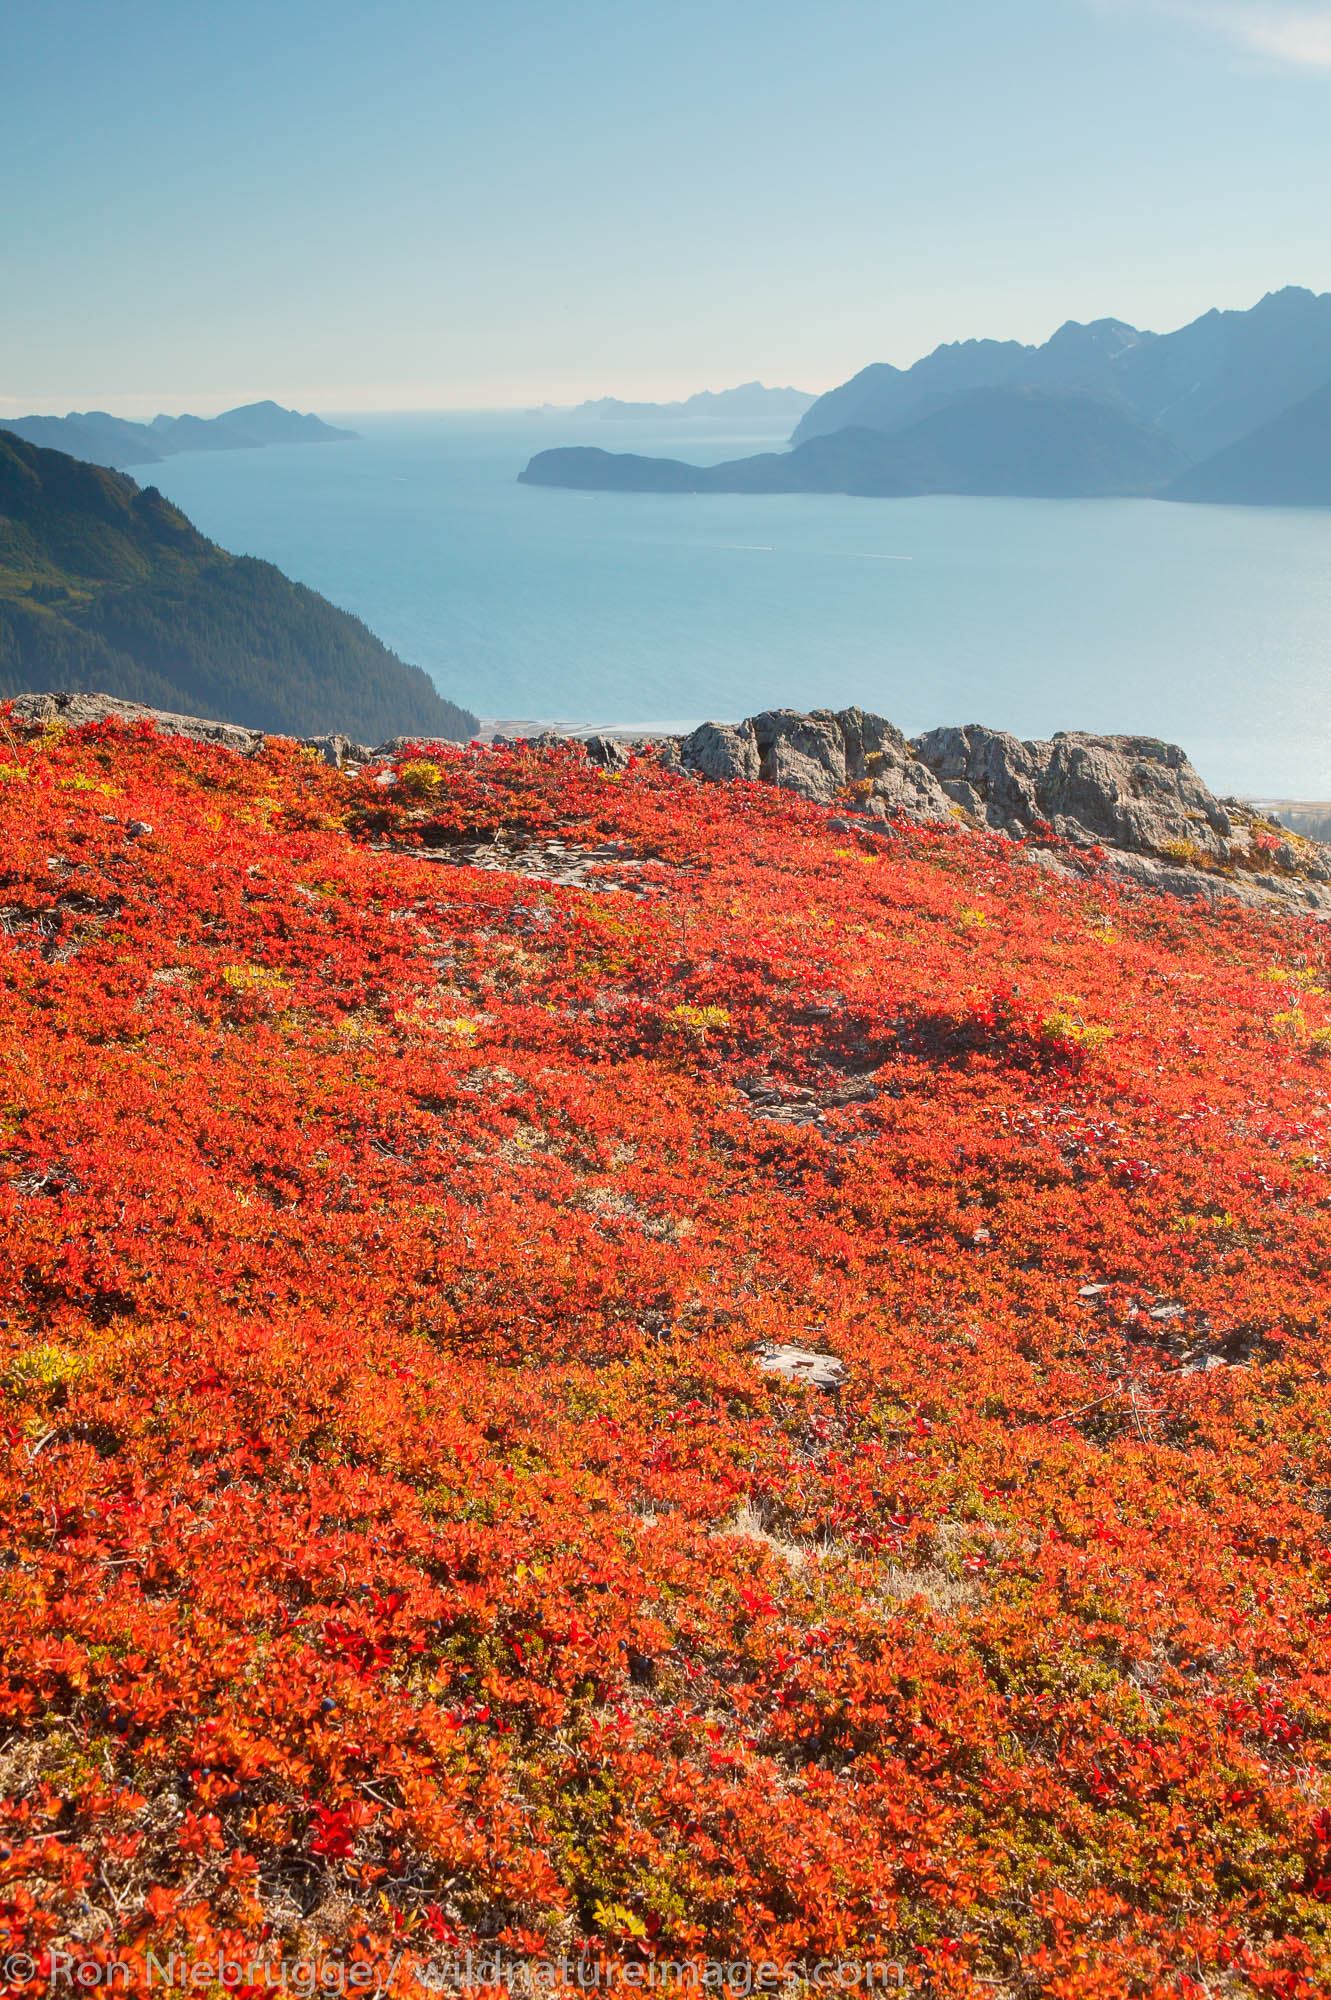 Fall colors on Mt. Alice looking down on Resurrection Bay, Chugach Natonal Forest, Seward, Alaska.